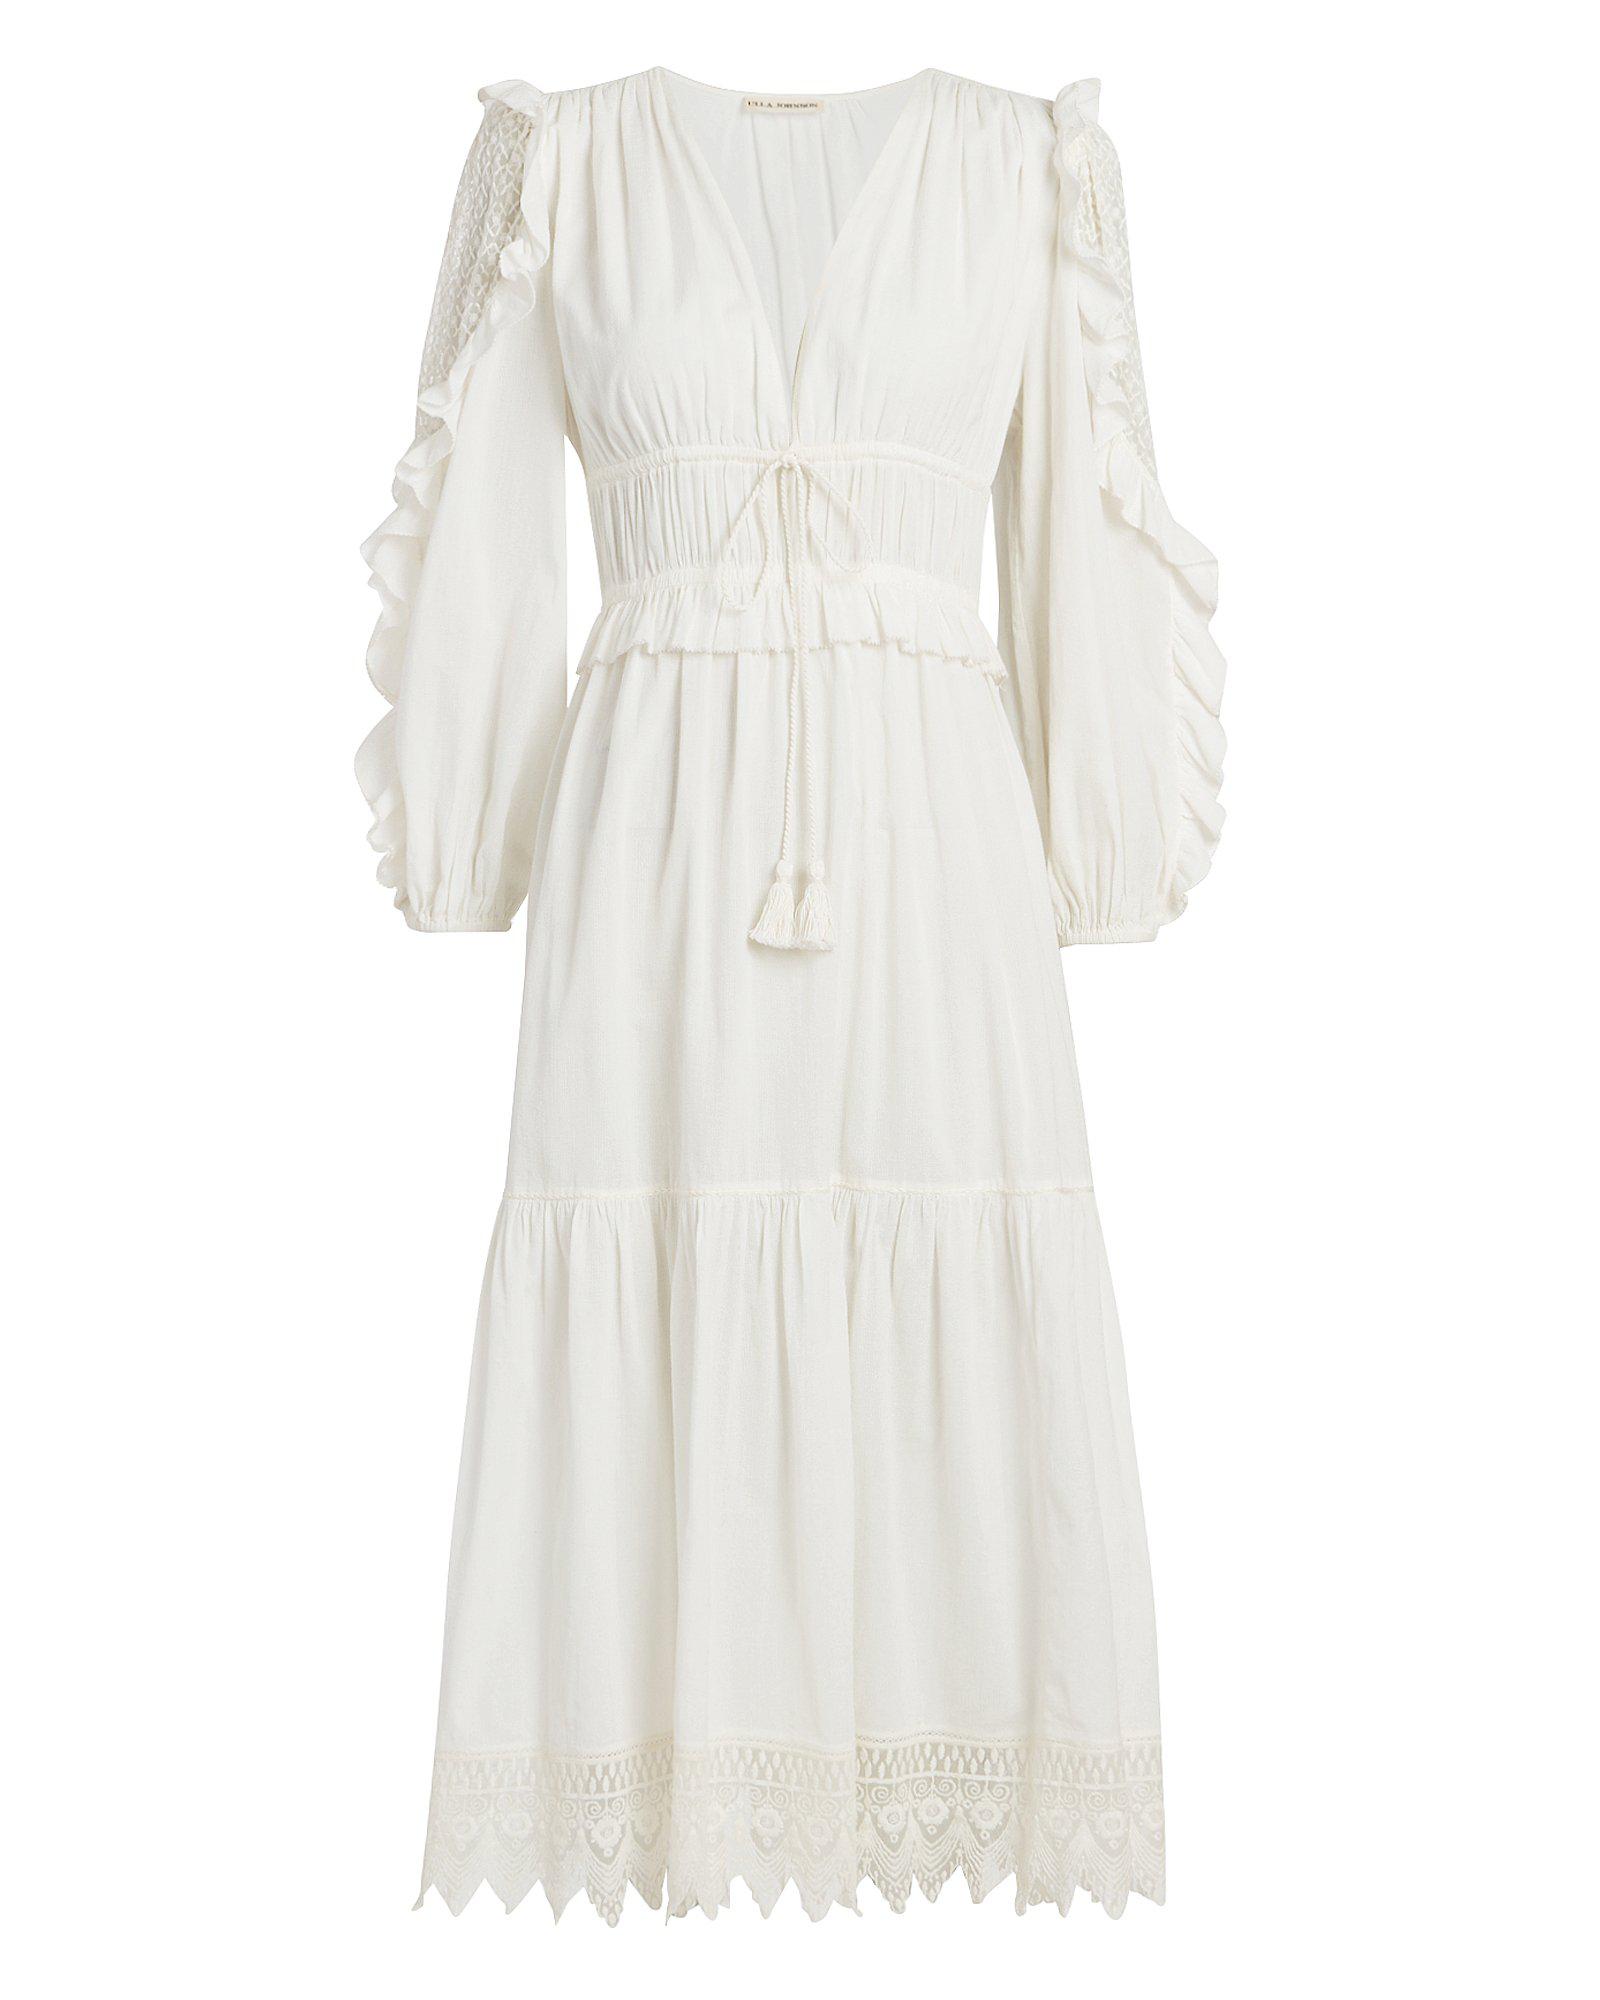 1e5c9c672dcf Ulla Johnson Sheila Lace Trim Dress White